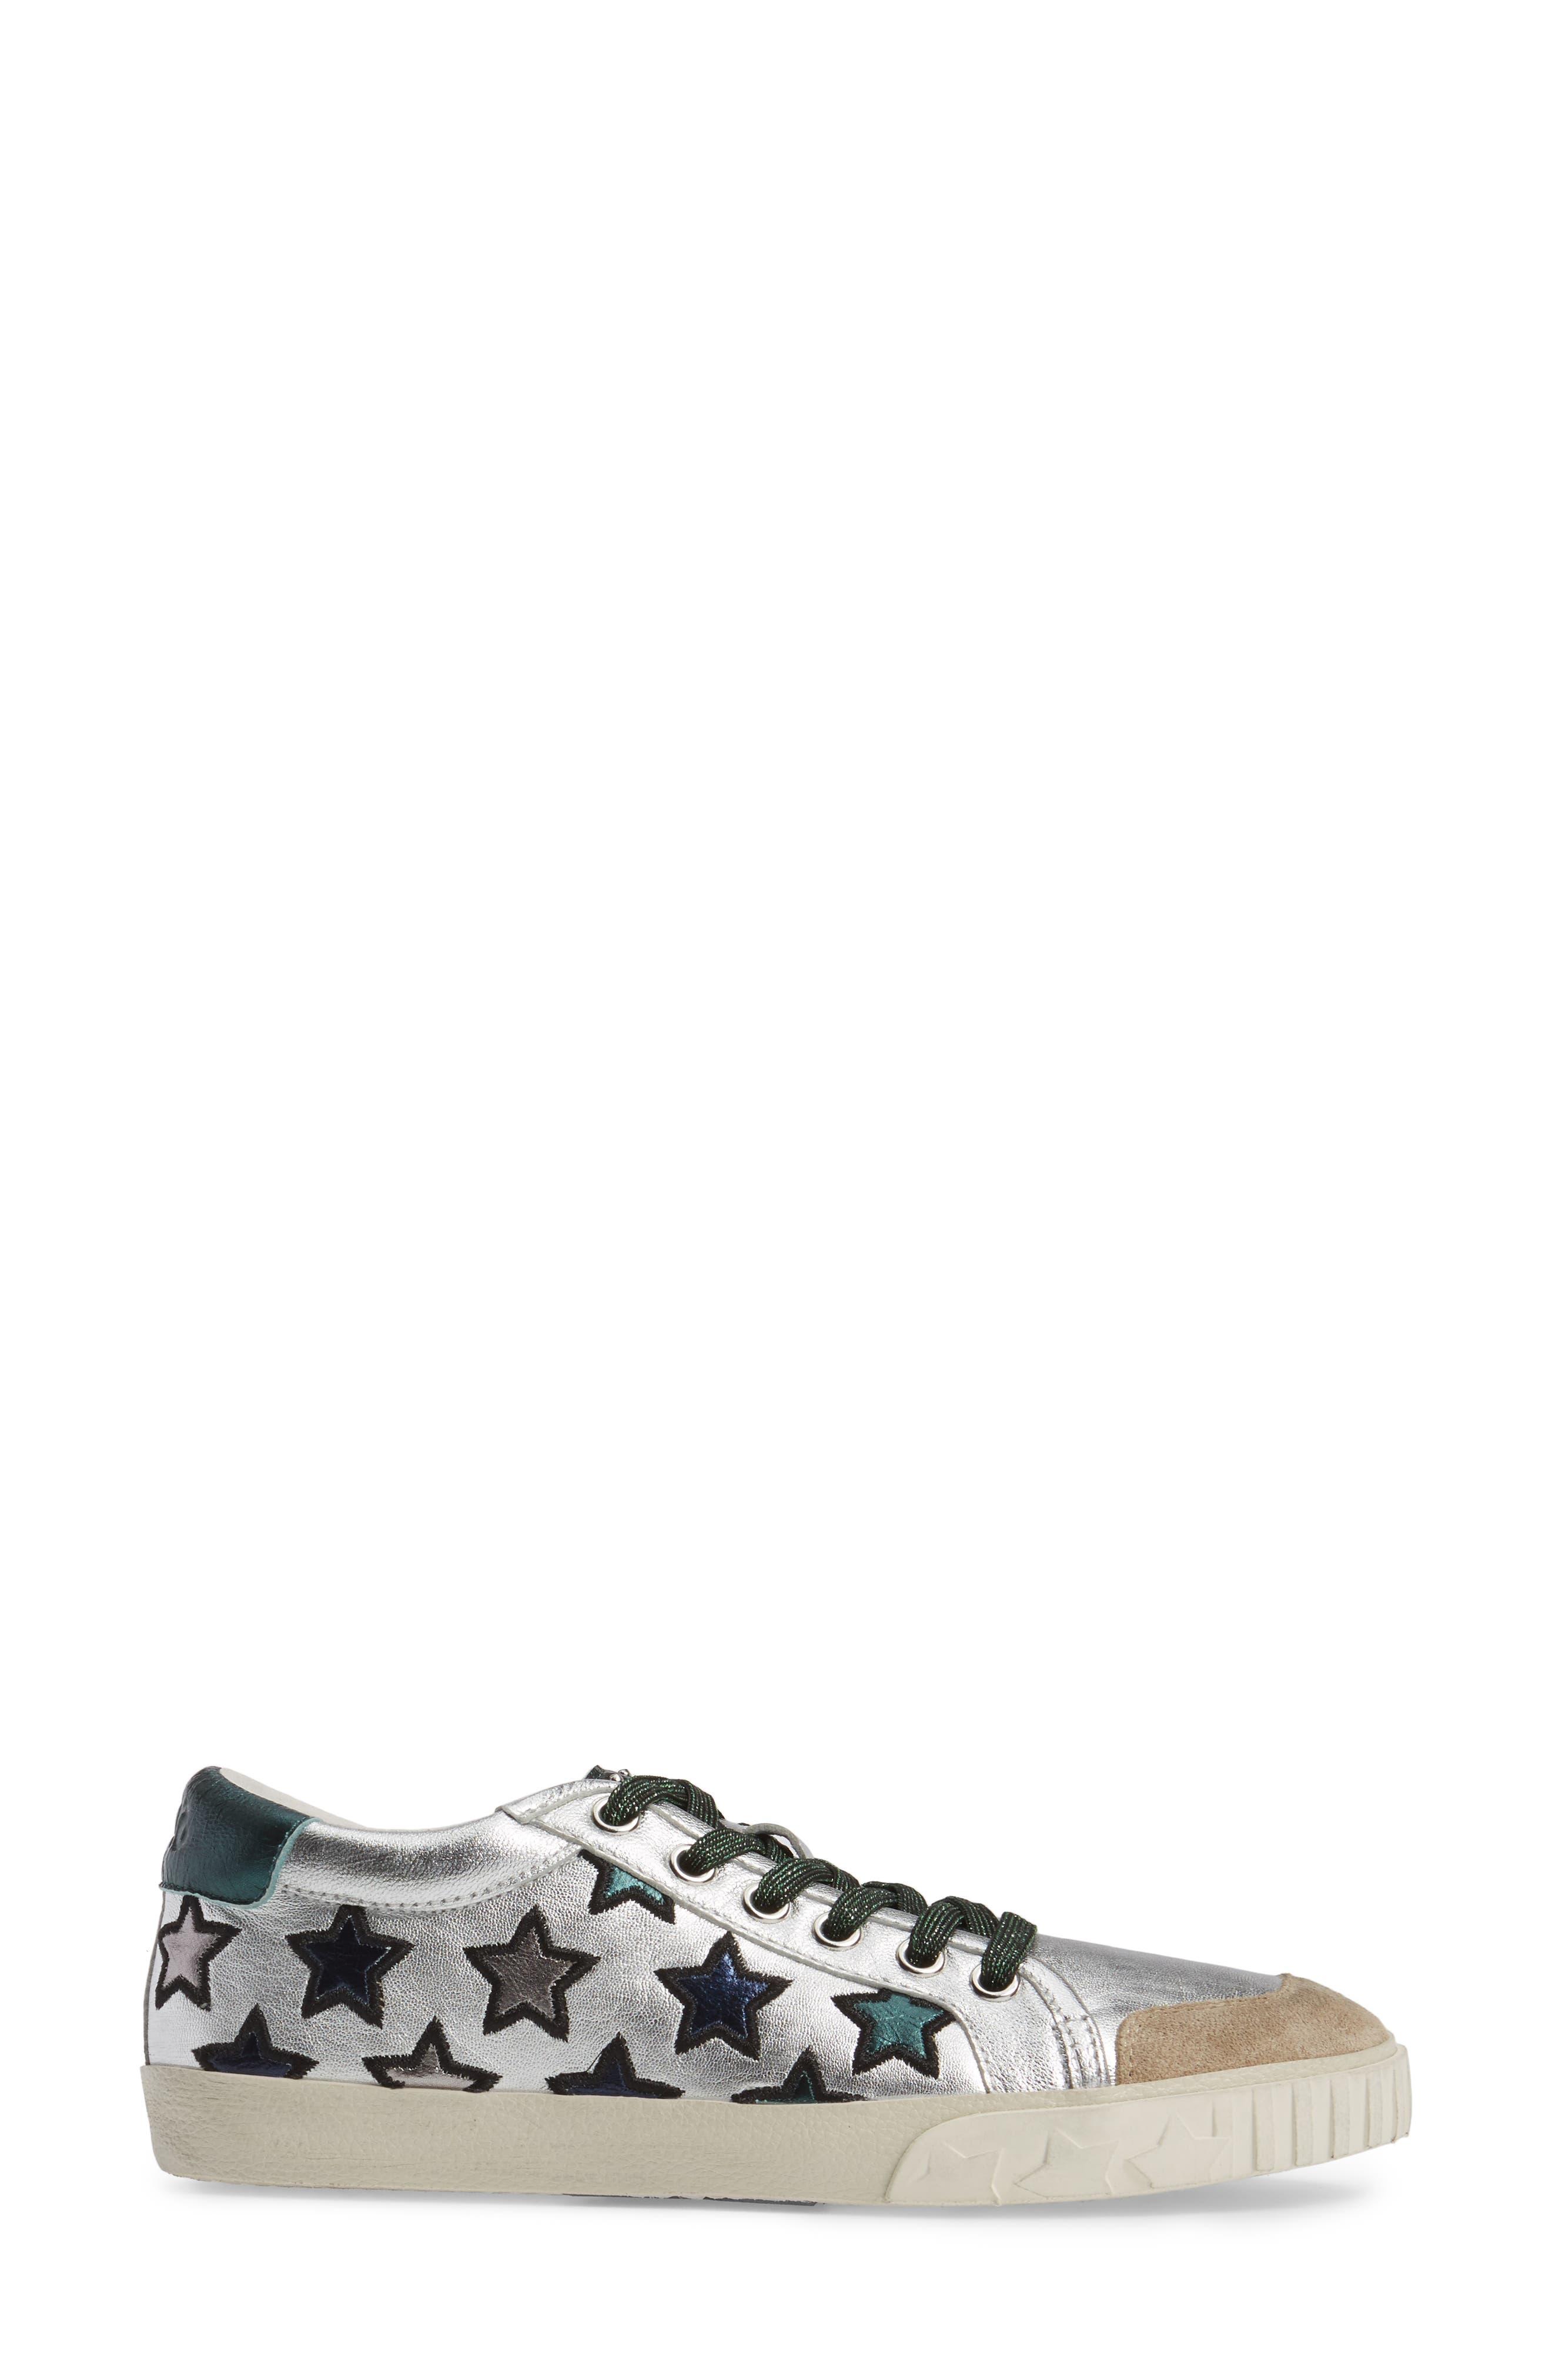 Majestic Sneaker,                             Alternate thumbnail 3, color,                             190